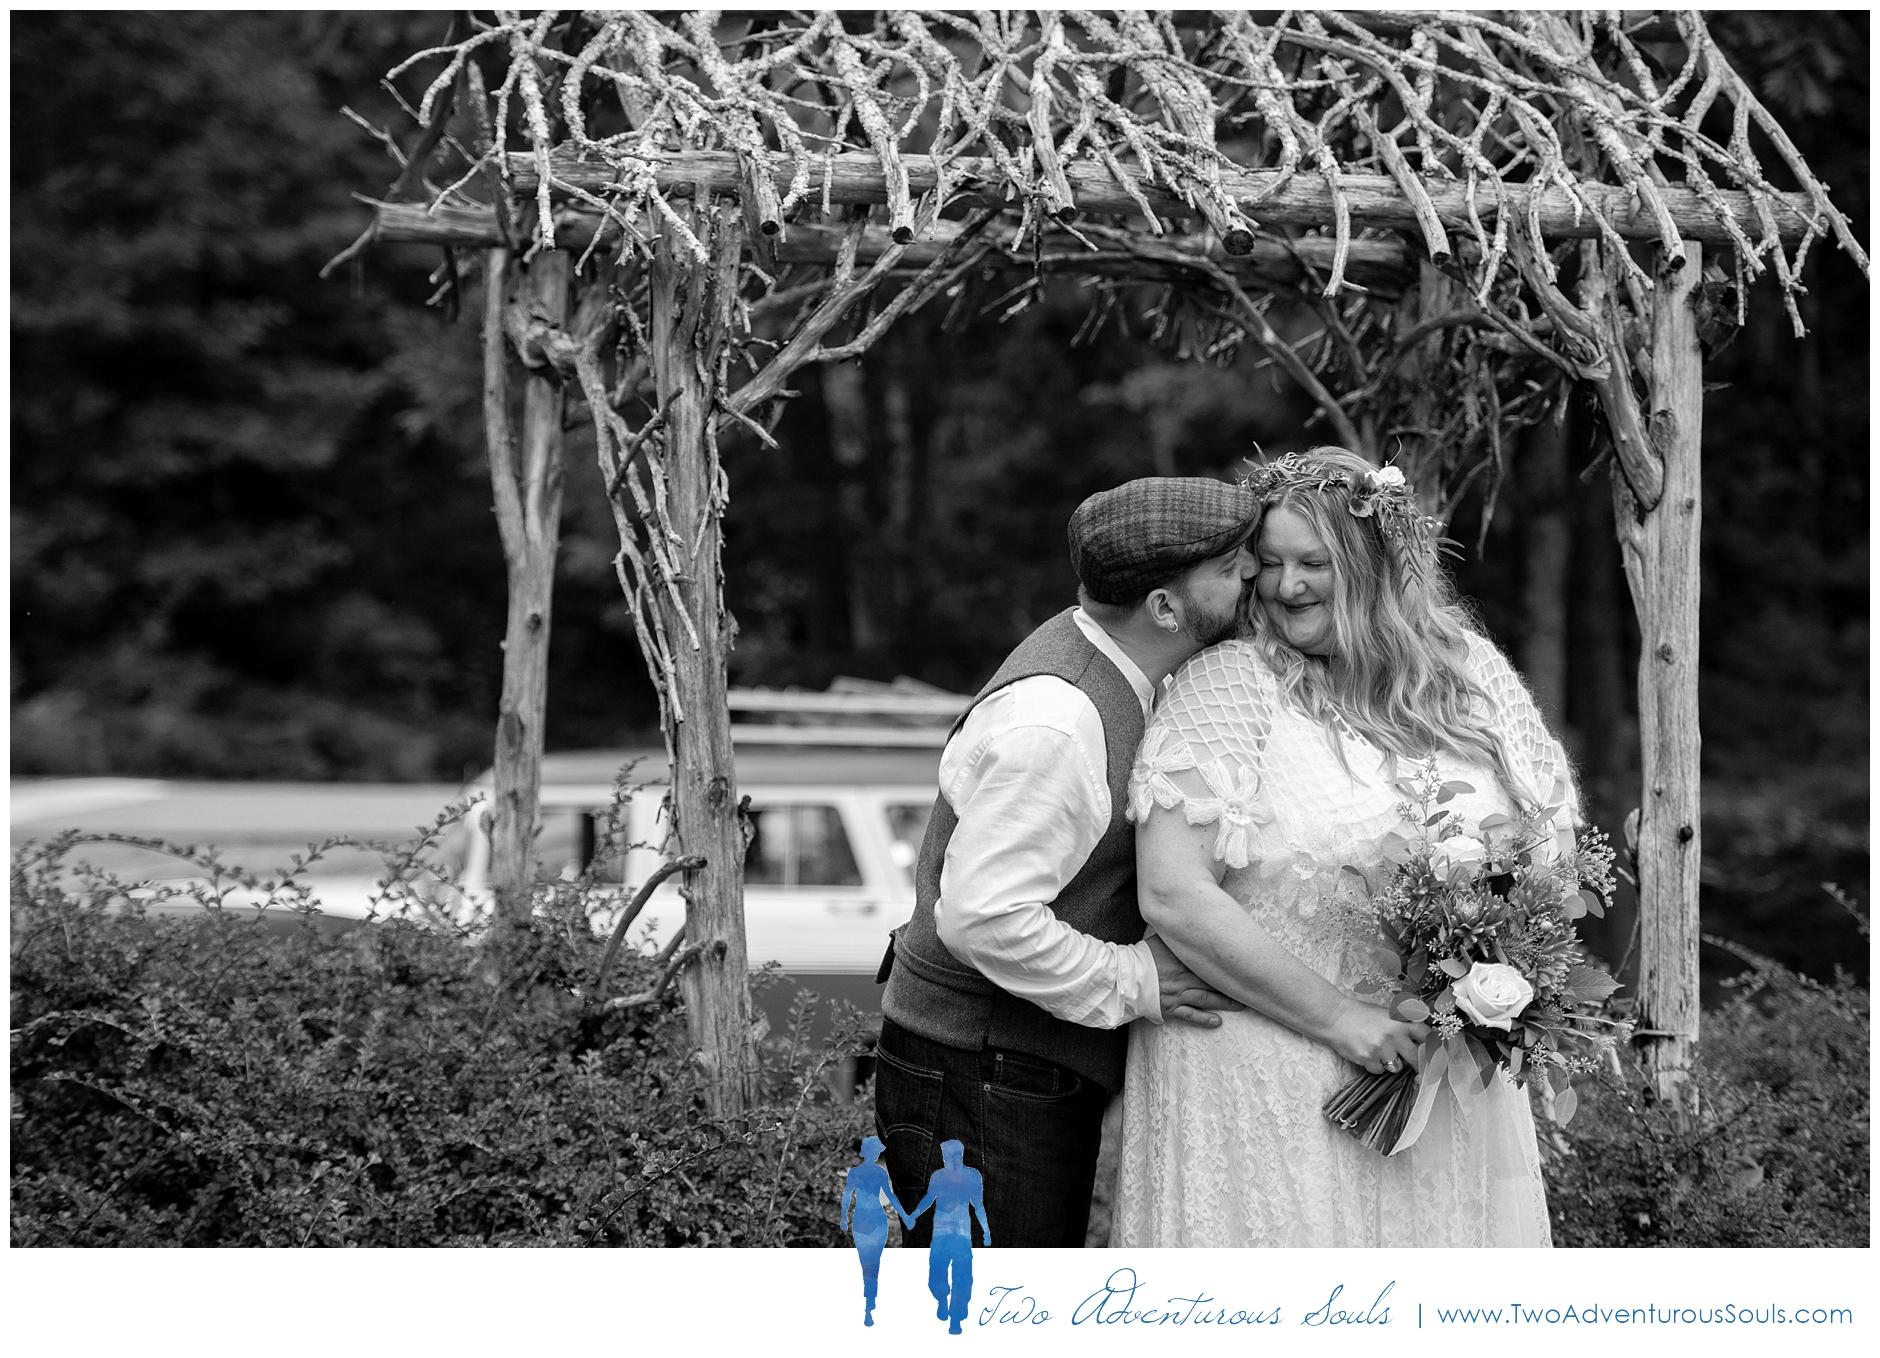 091218 - Chad & Kimmi - sneaks-33_Hidden Pond Wedding, Earth at Hidden Pond, Kennebunkport Wedding.jpg